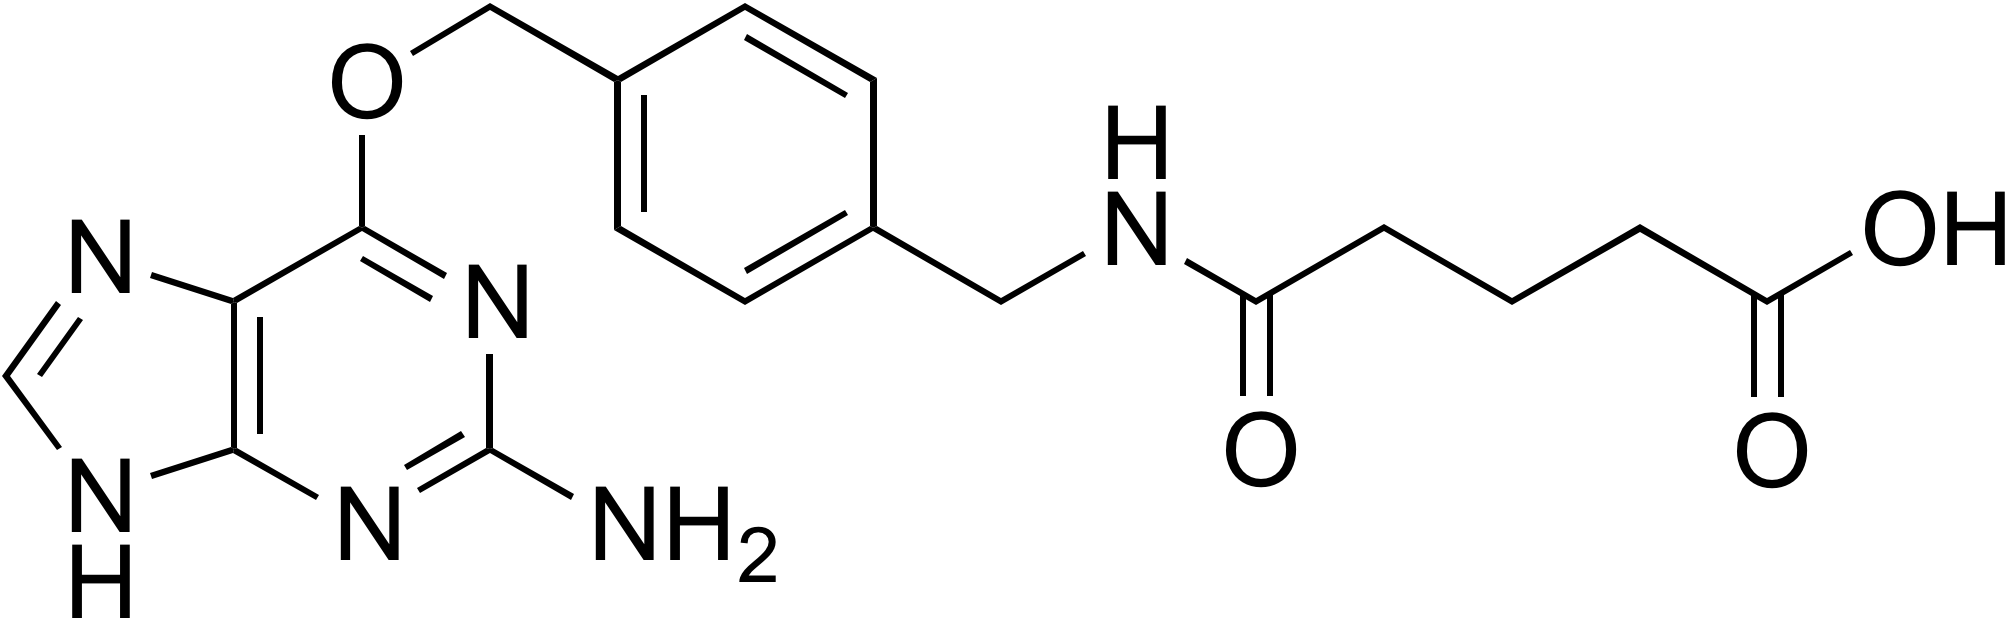 O6-(4-Glutarylamidomethylbenzyl)guanine